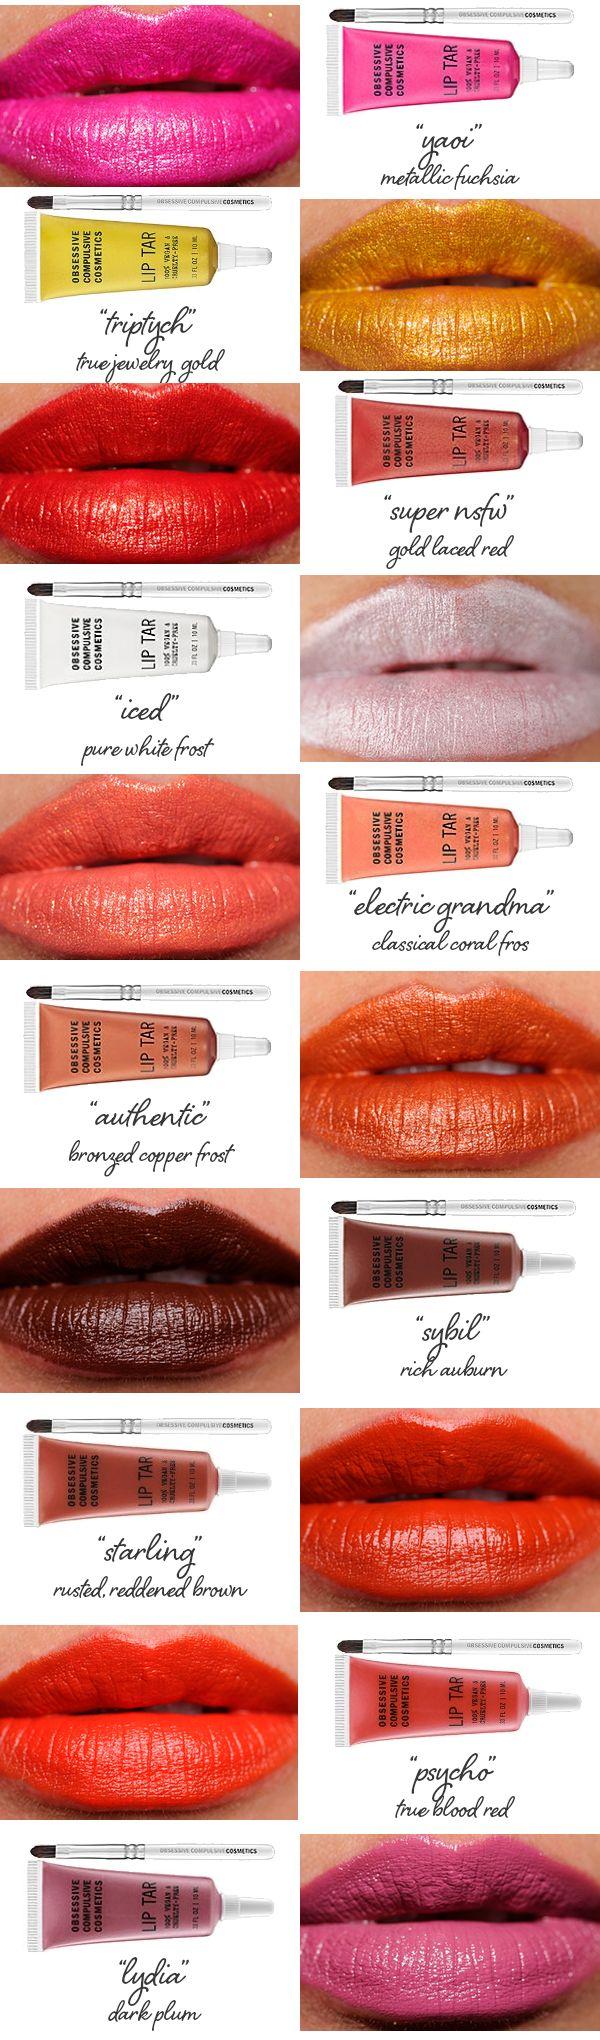 Lip Slay Red Lip Set by Illamasqua #19